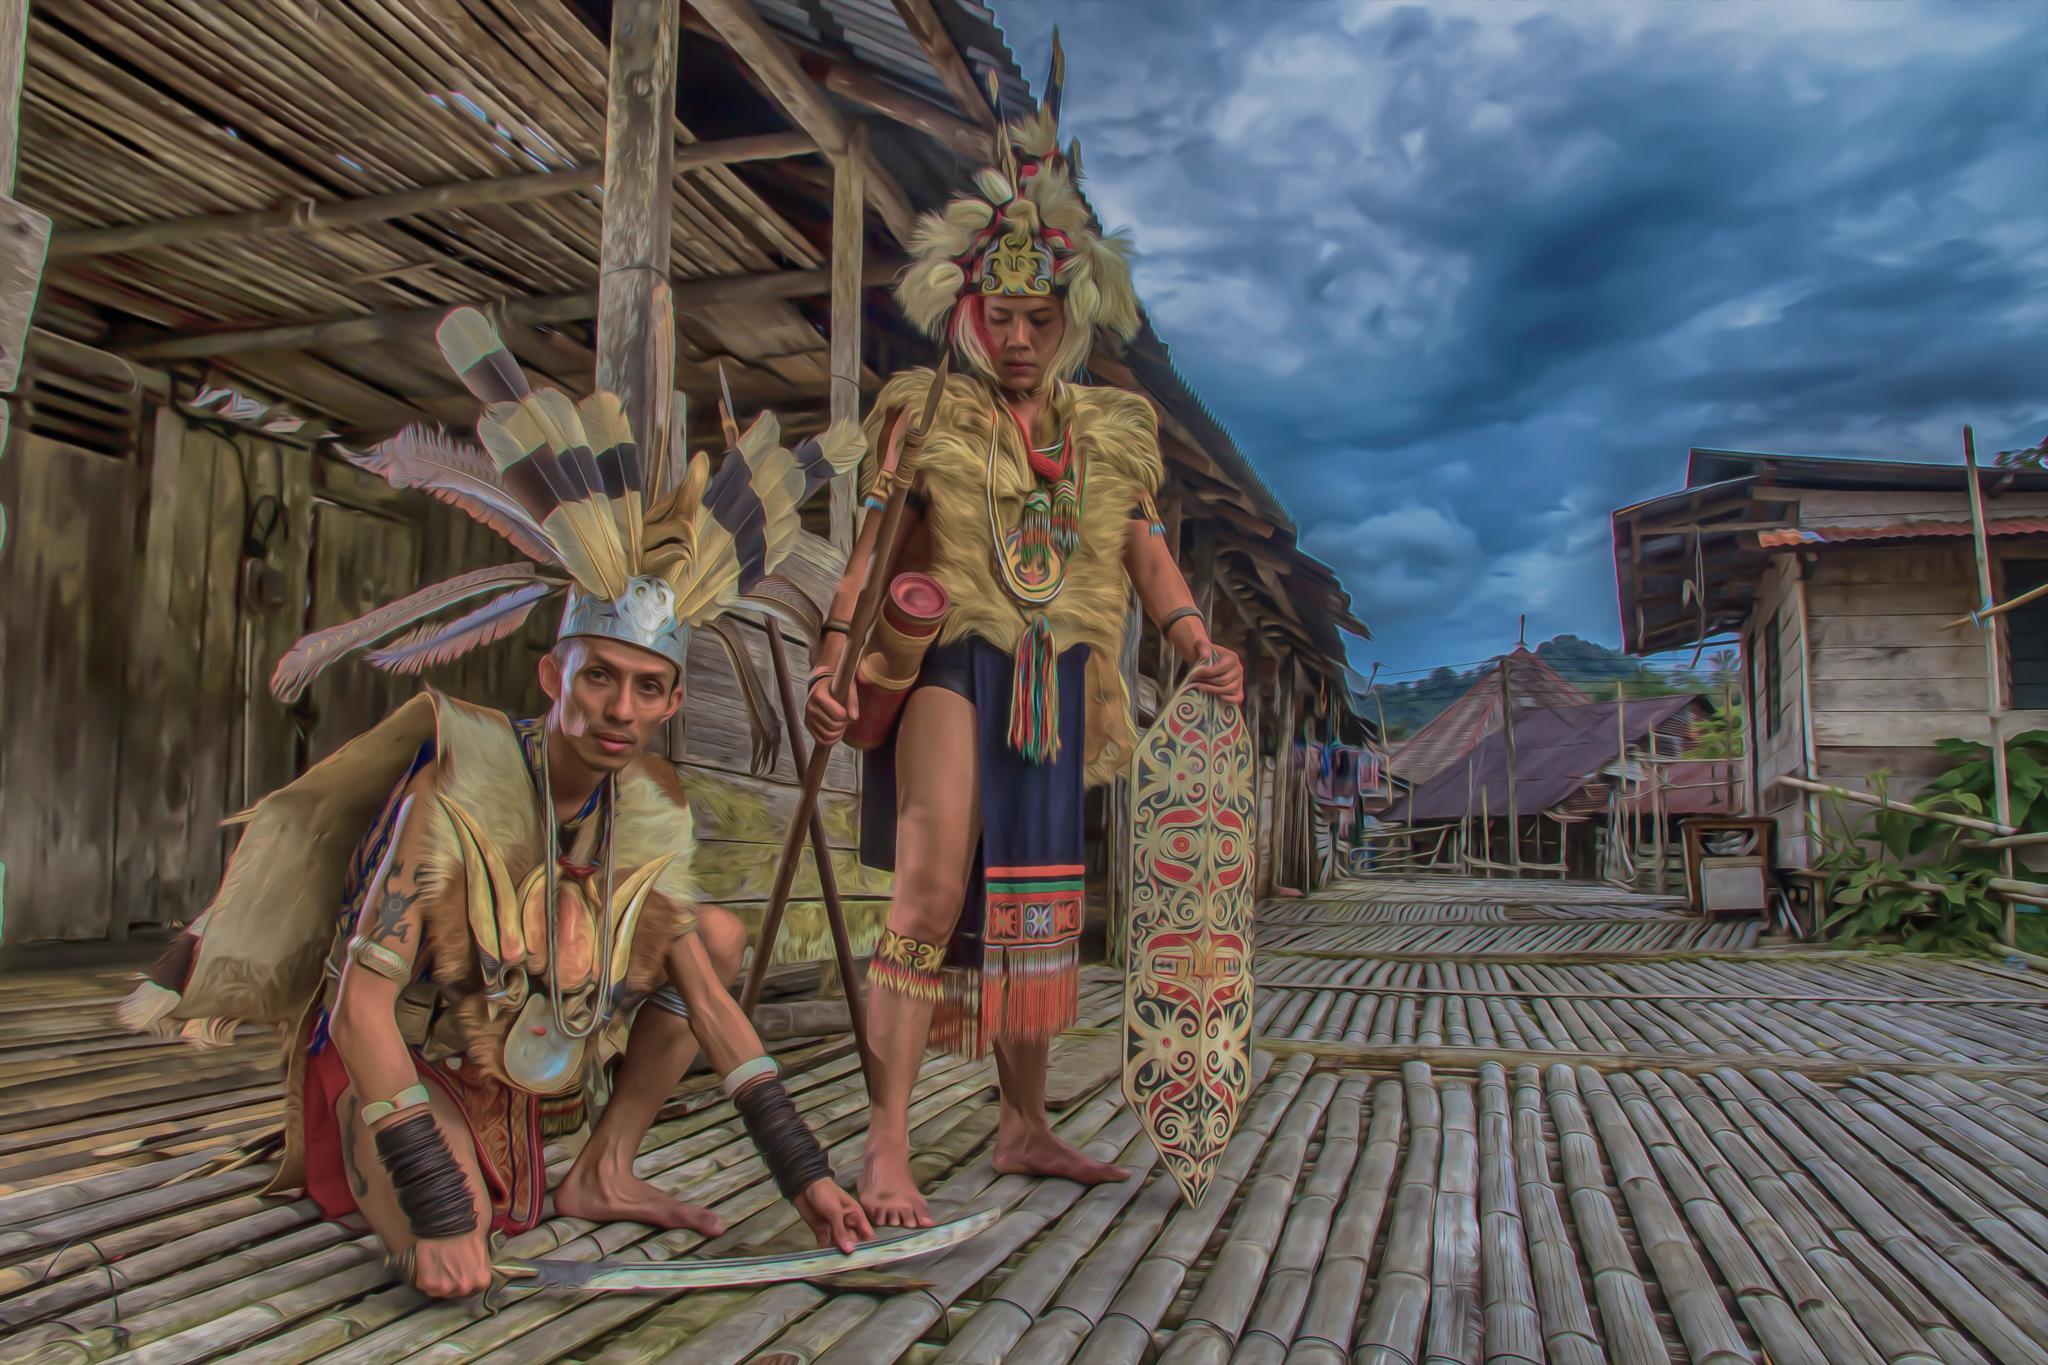 Bornean warriors by BakirBujang